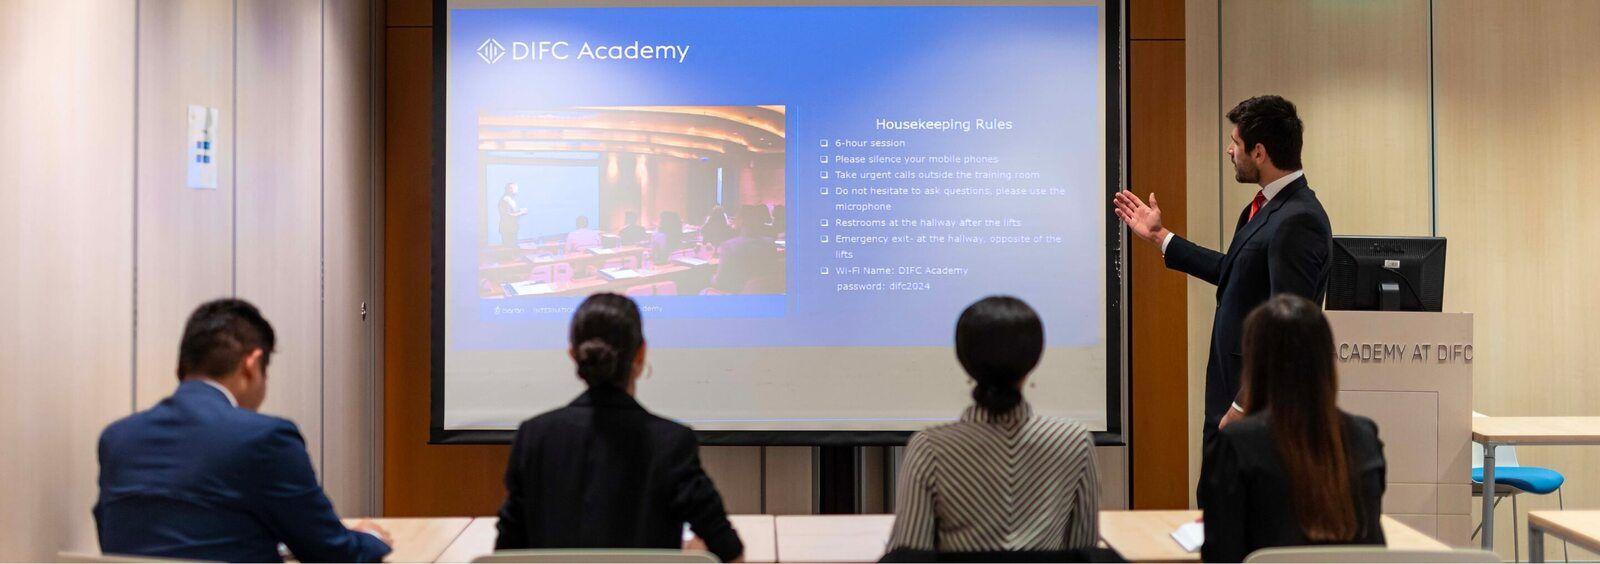 DIFC Academy Venues